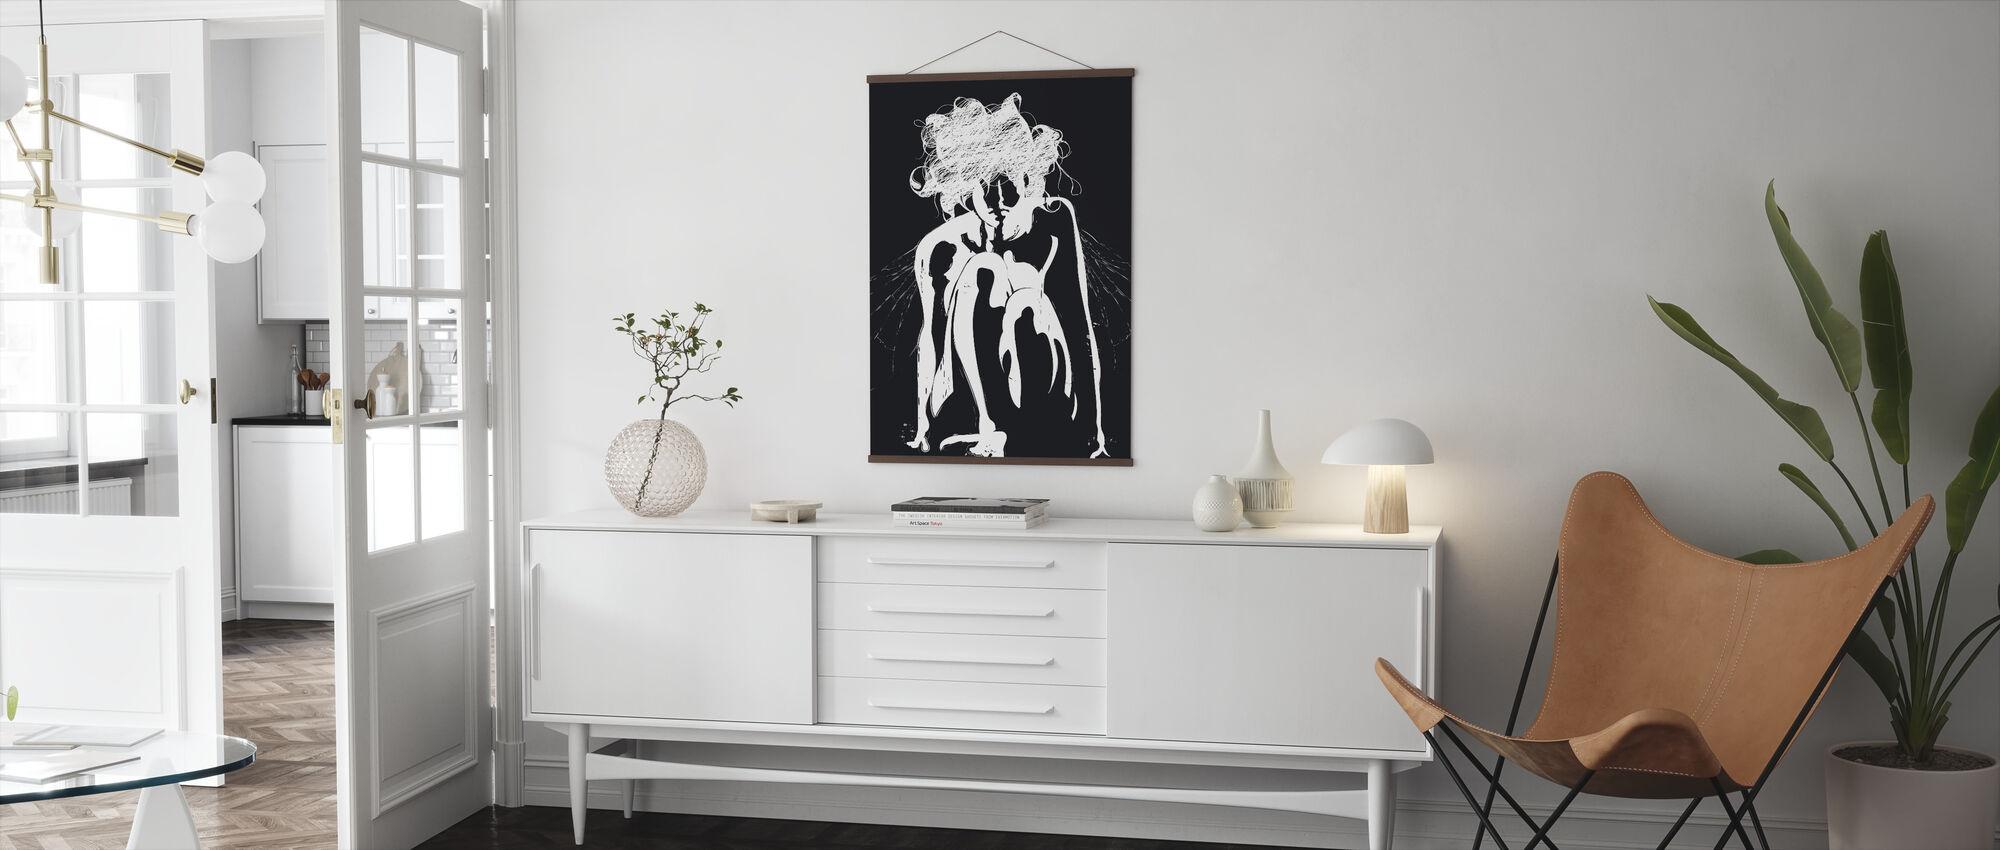 Tinker - Zwart - Poster - Woonkamer